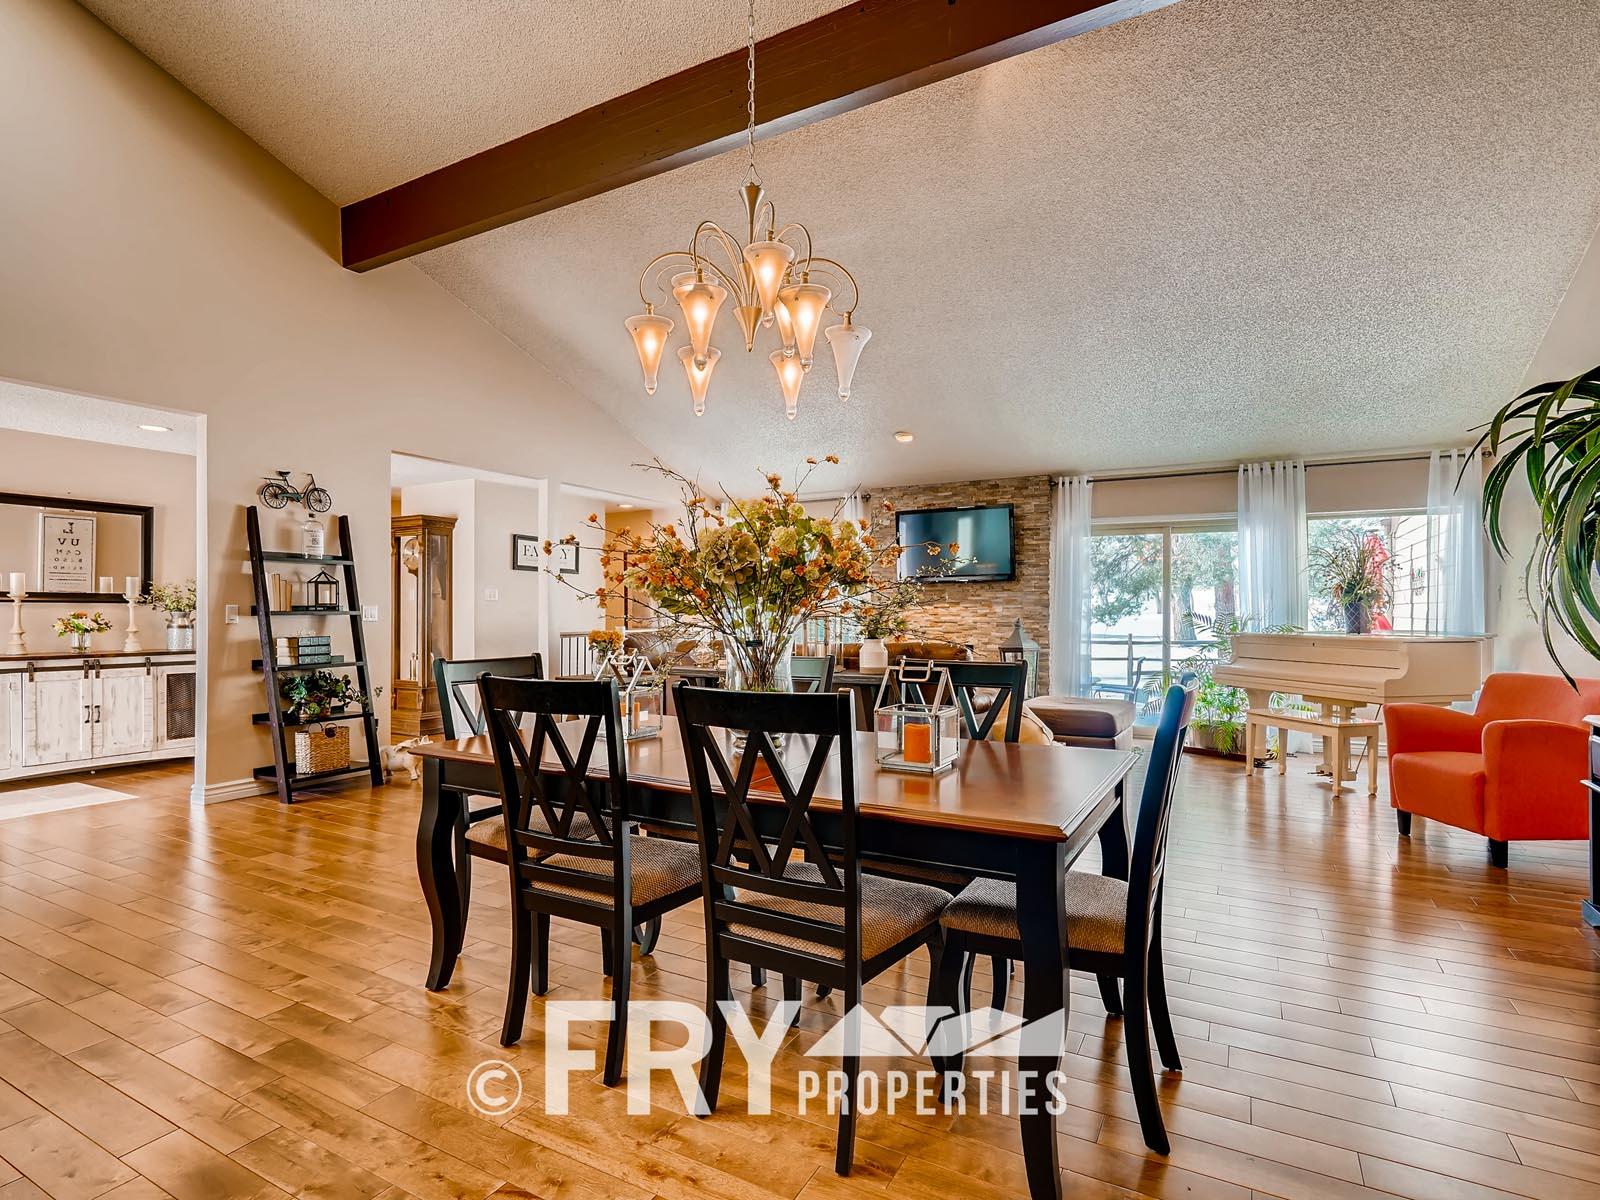 6305 W 6th Ave Unit A6-print-006-4-Dining Room-3600x2400-300dpi